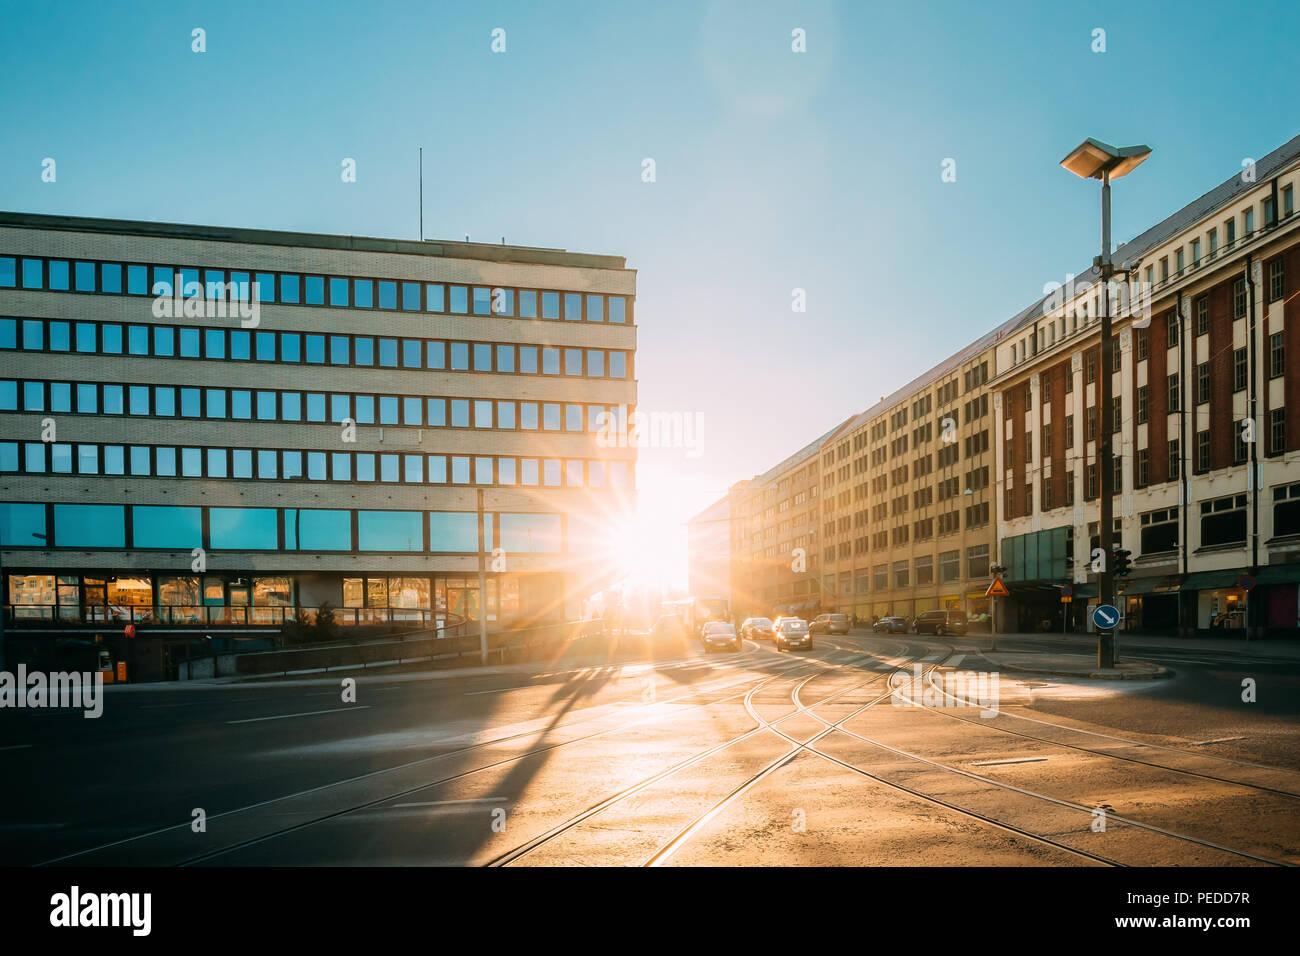 Helsinki, Finnland - 11. Dezember 2016: Blick auf siltasaarenkatu Straße. Fahrende Autos im Sonnenlicht Sonnenuntergang Sonnenaufgang Stockbild